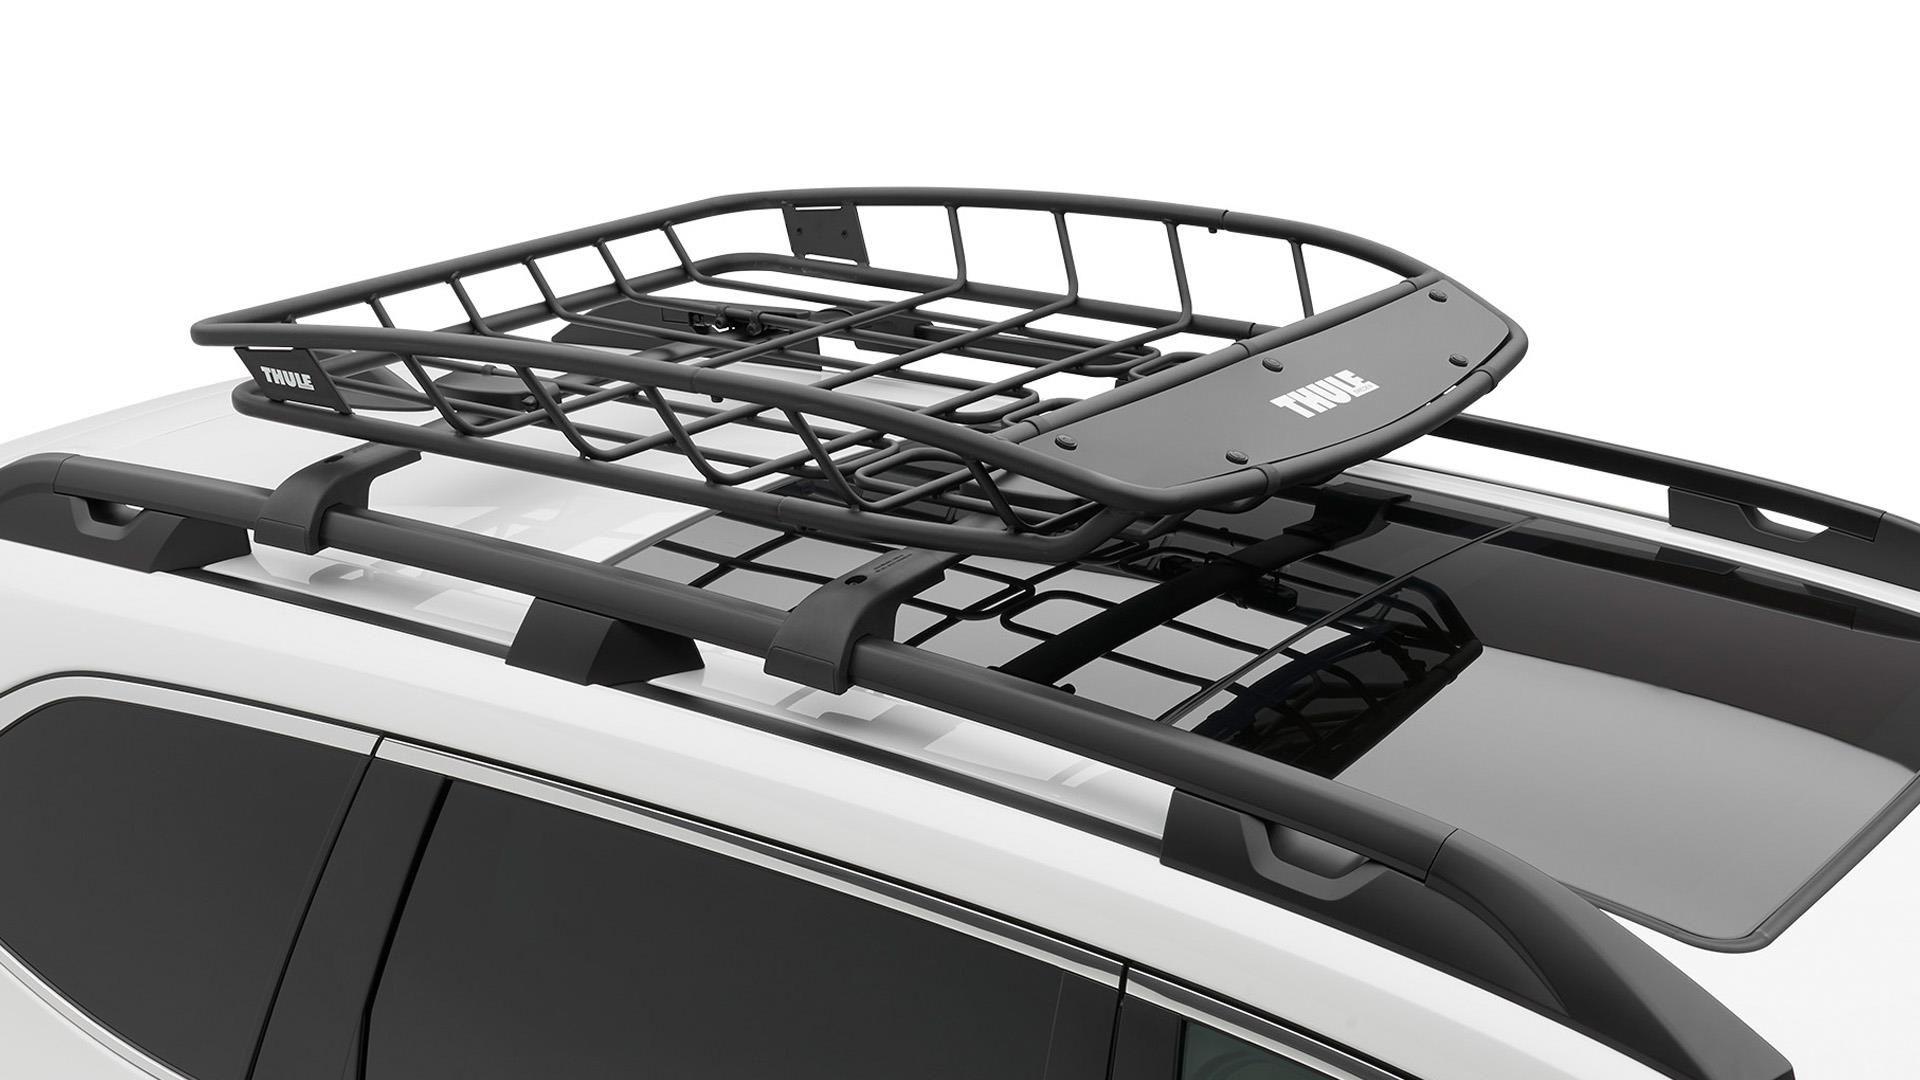 Thule Roof Cage For Subaru Crosstrek Subaru Subaru Crosstrek Thule